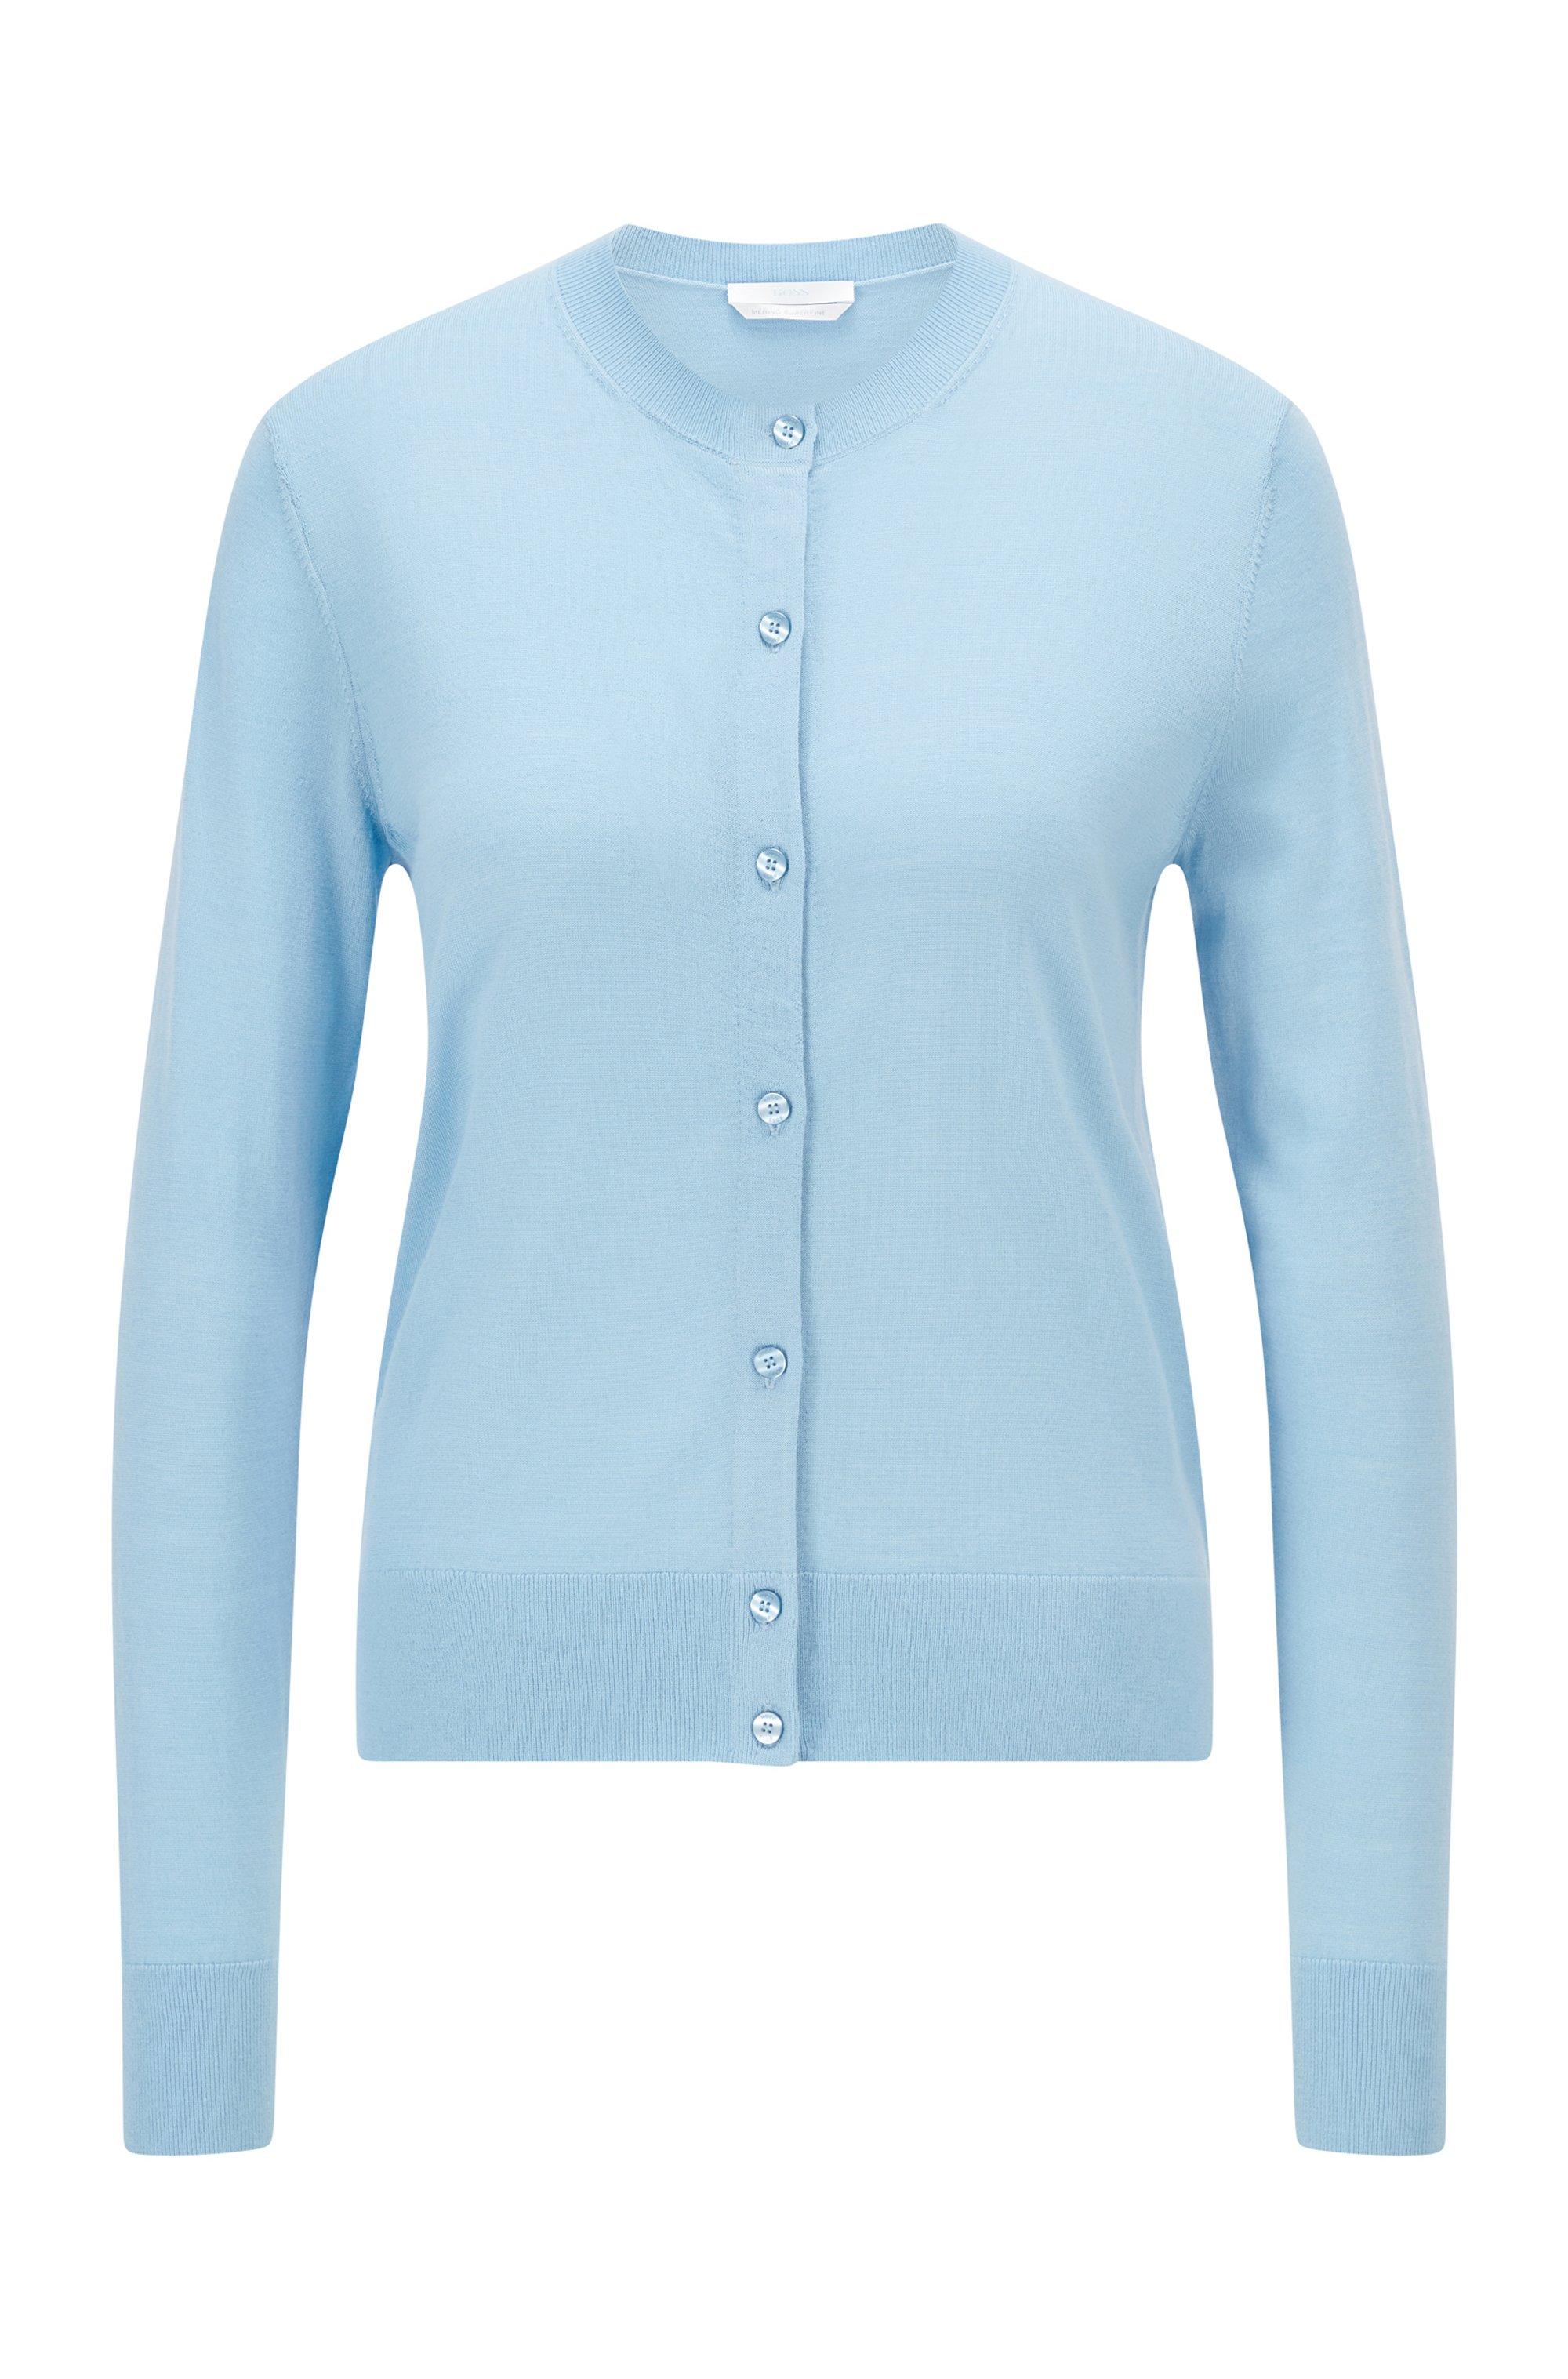 Button-through cardigan in virgin wool, Light Blue